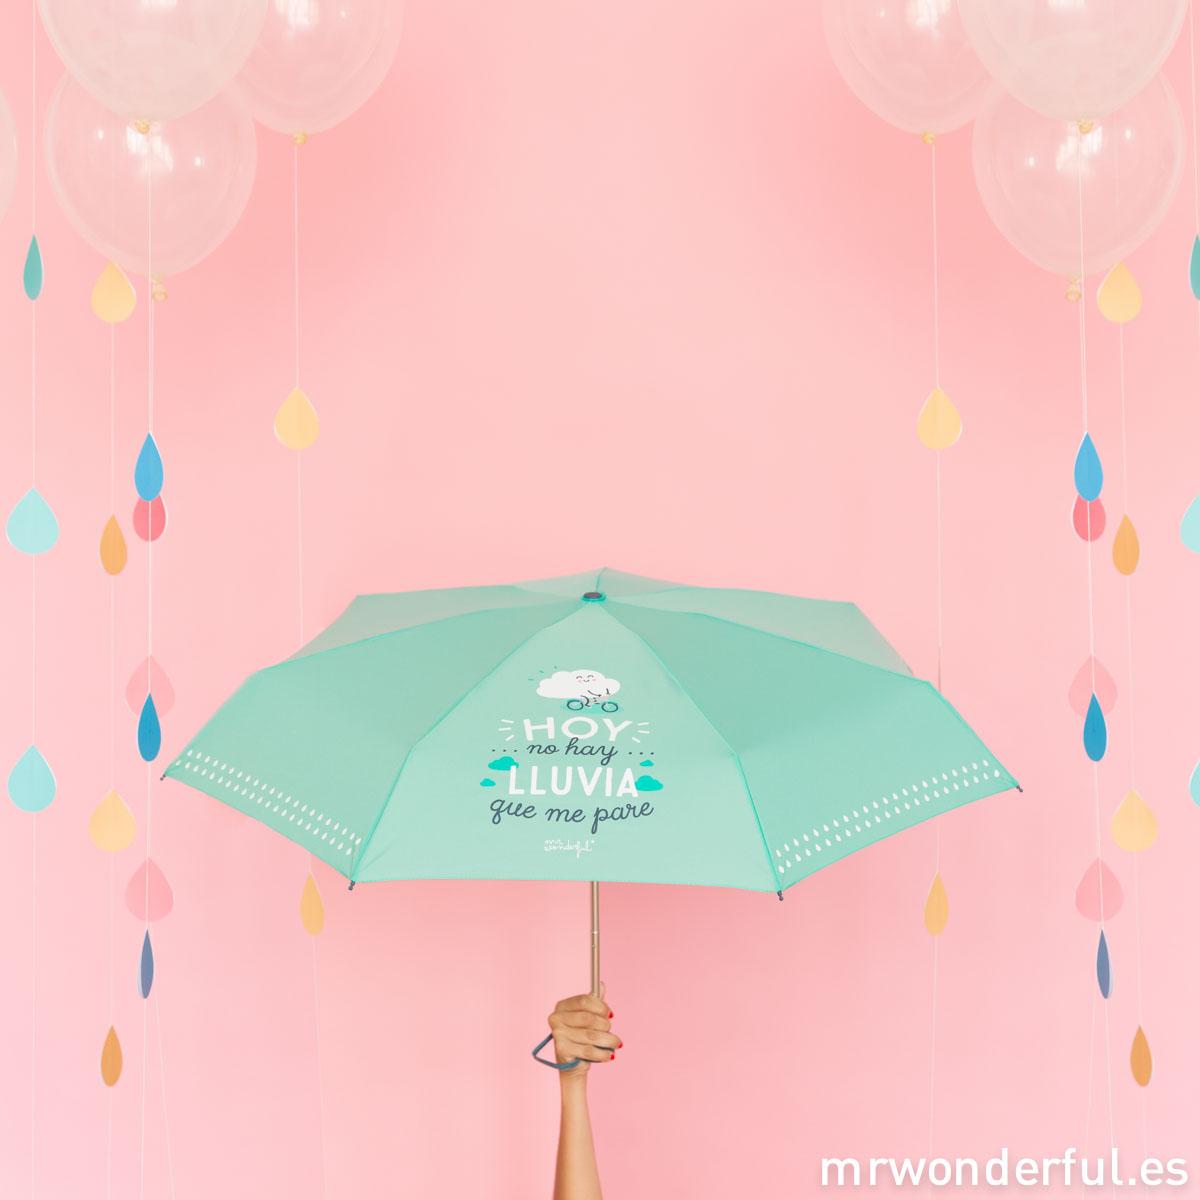 mrwonderful_8435460706889_paraguas_hoy-no-hay-lluvia-que-me-pare-ES-2